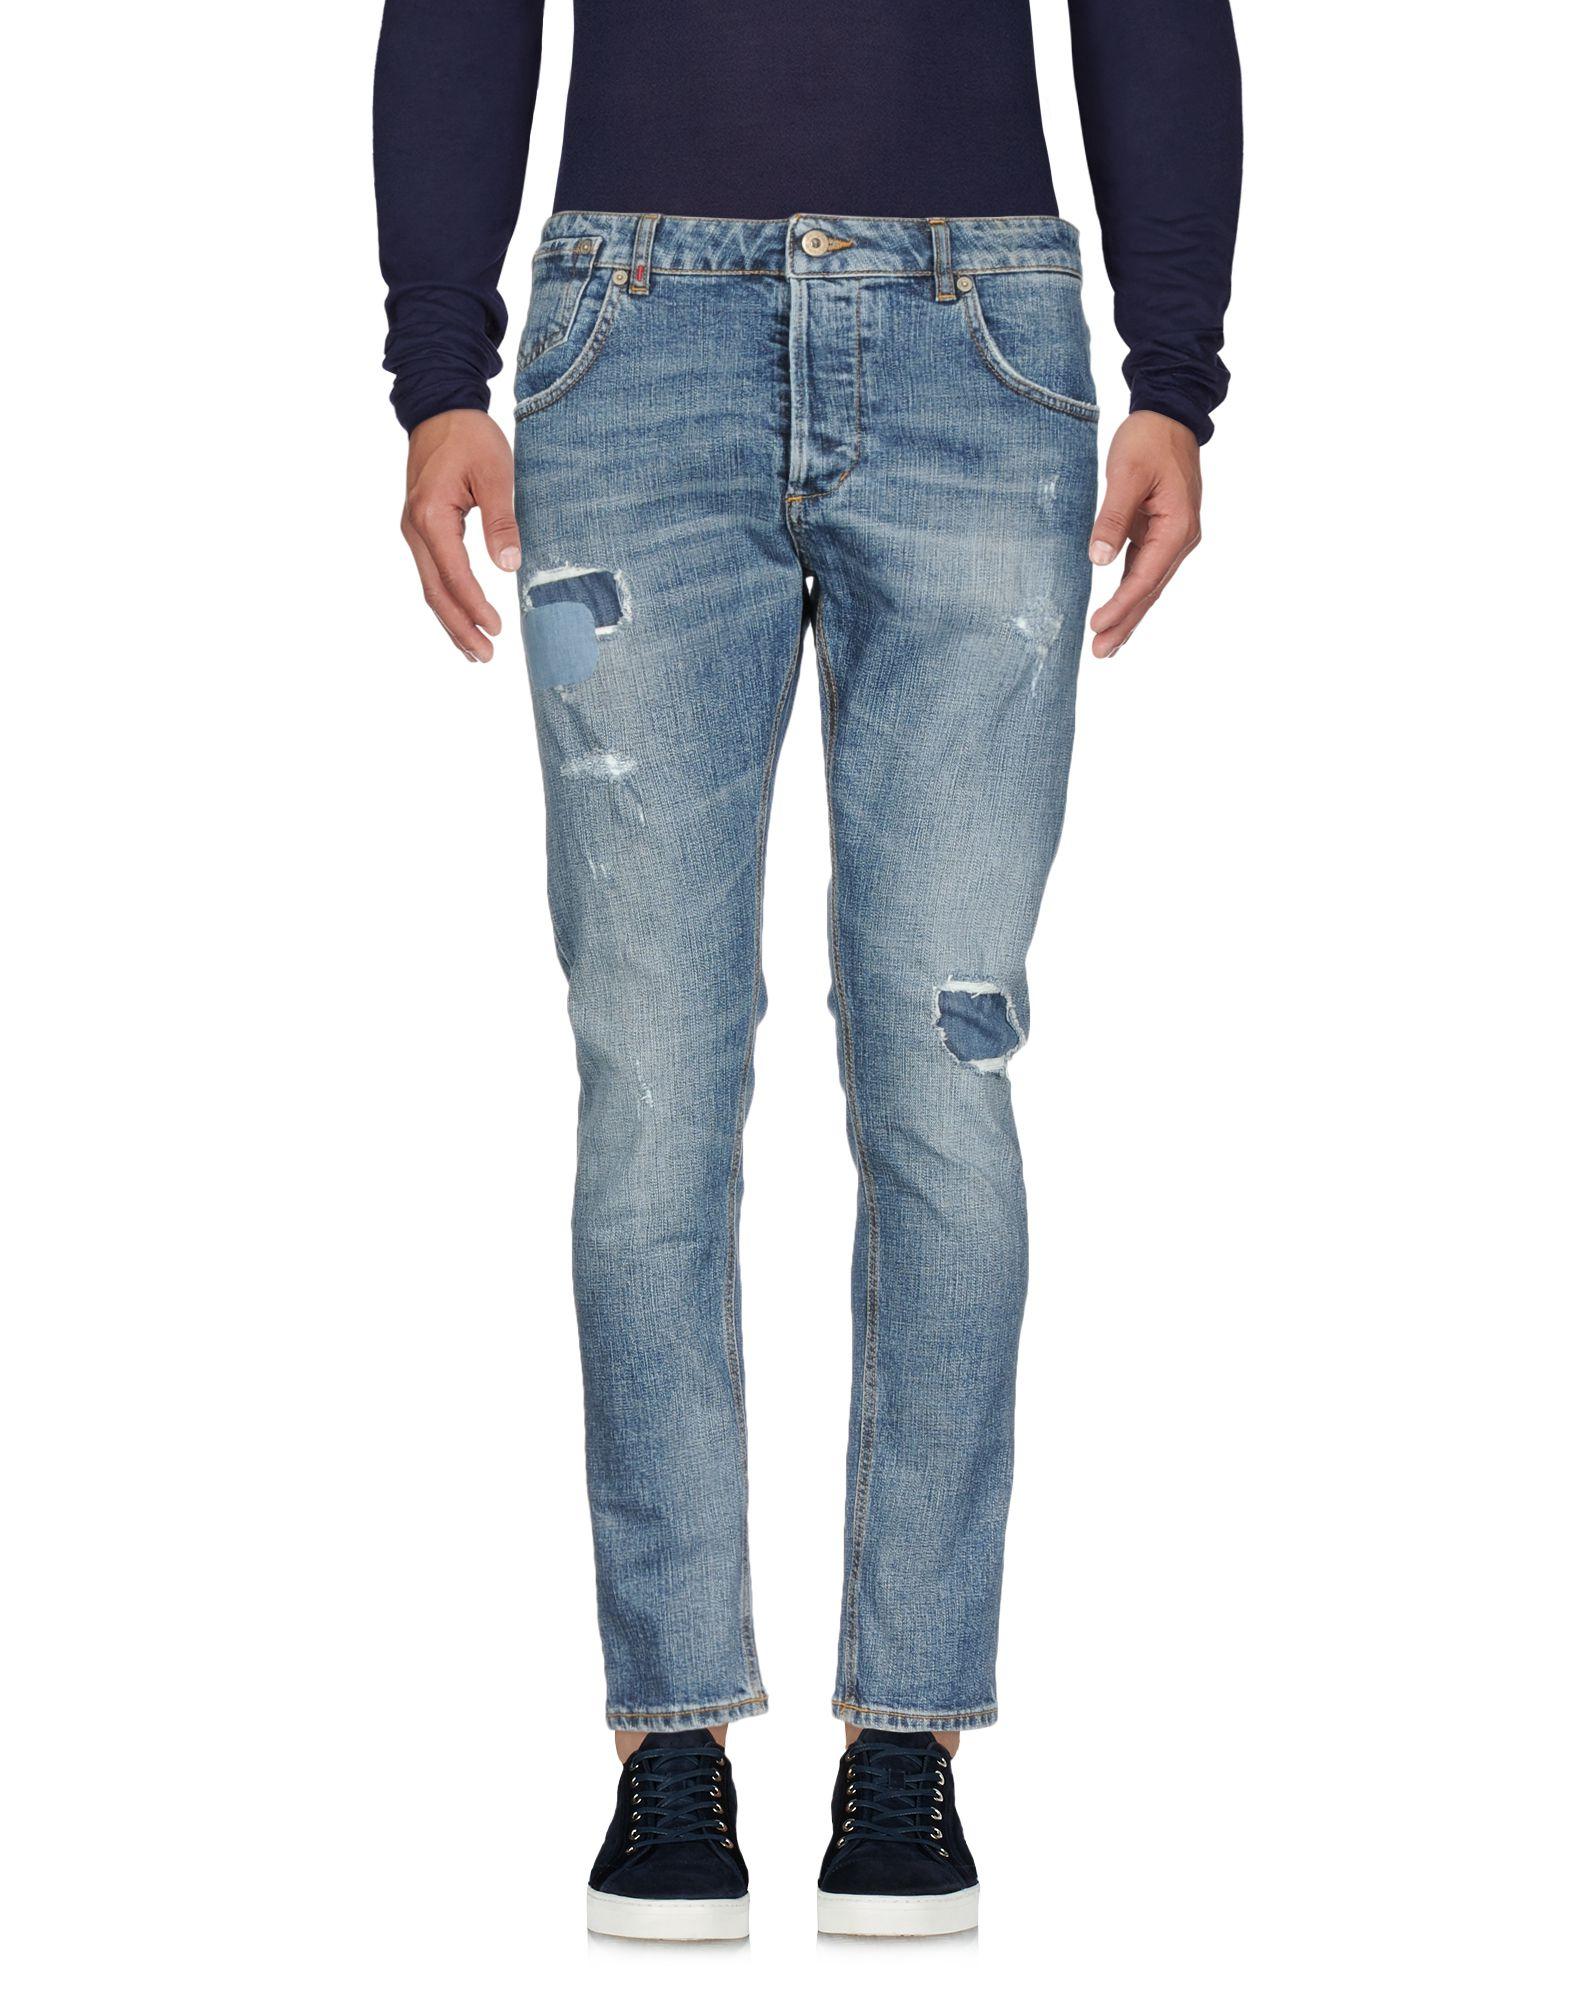 online Acquista Dondup Jeans Pantaloni Donna su Oq7PaIw